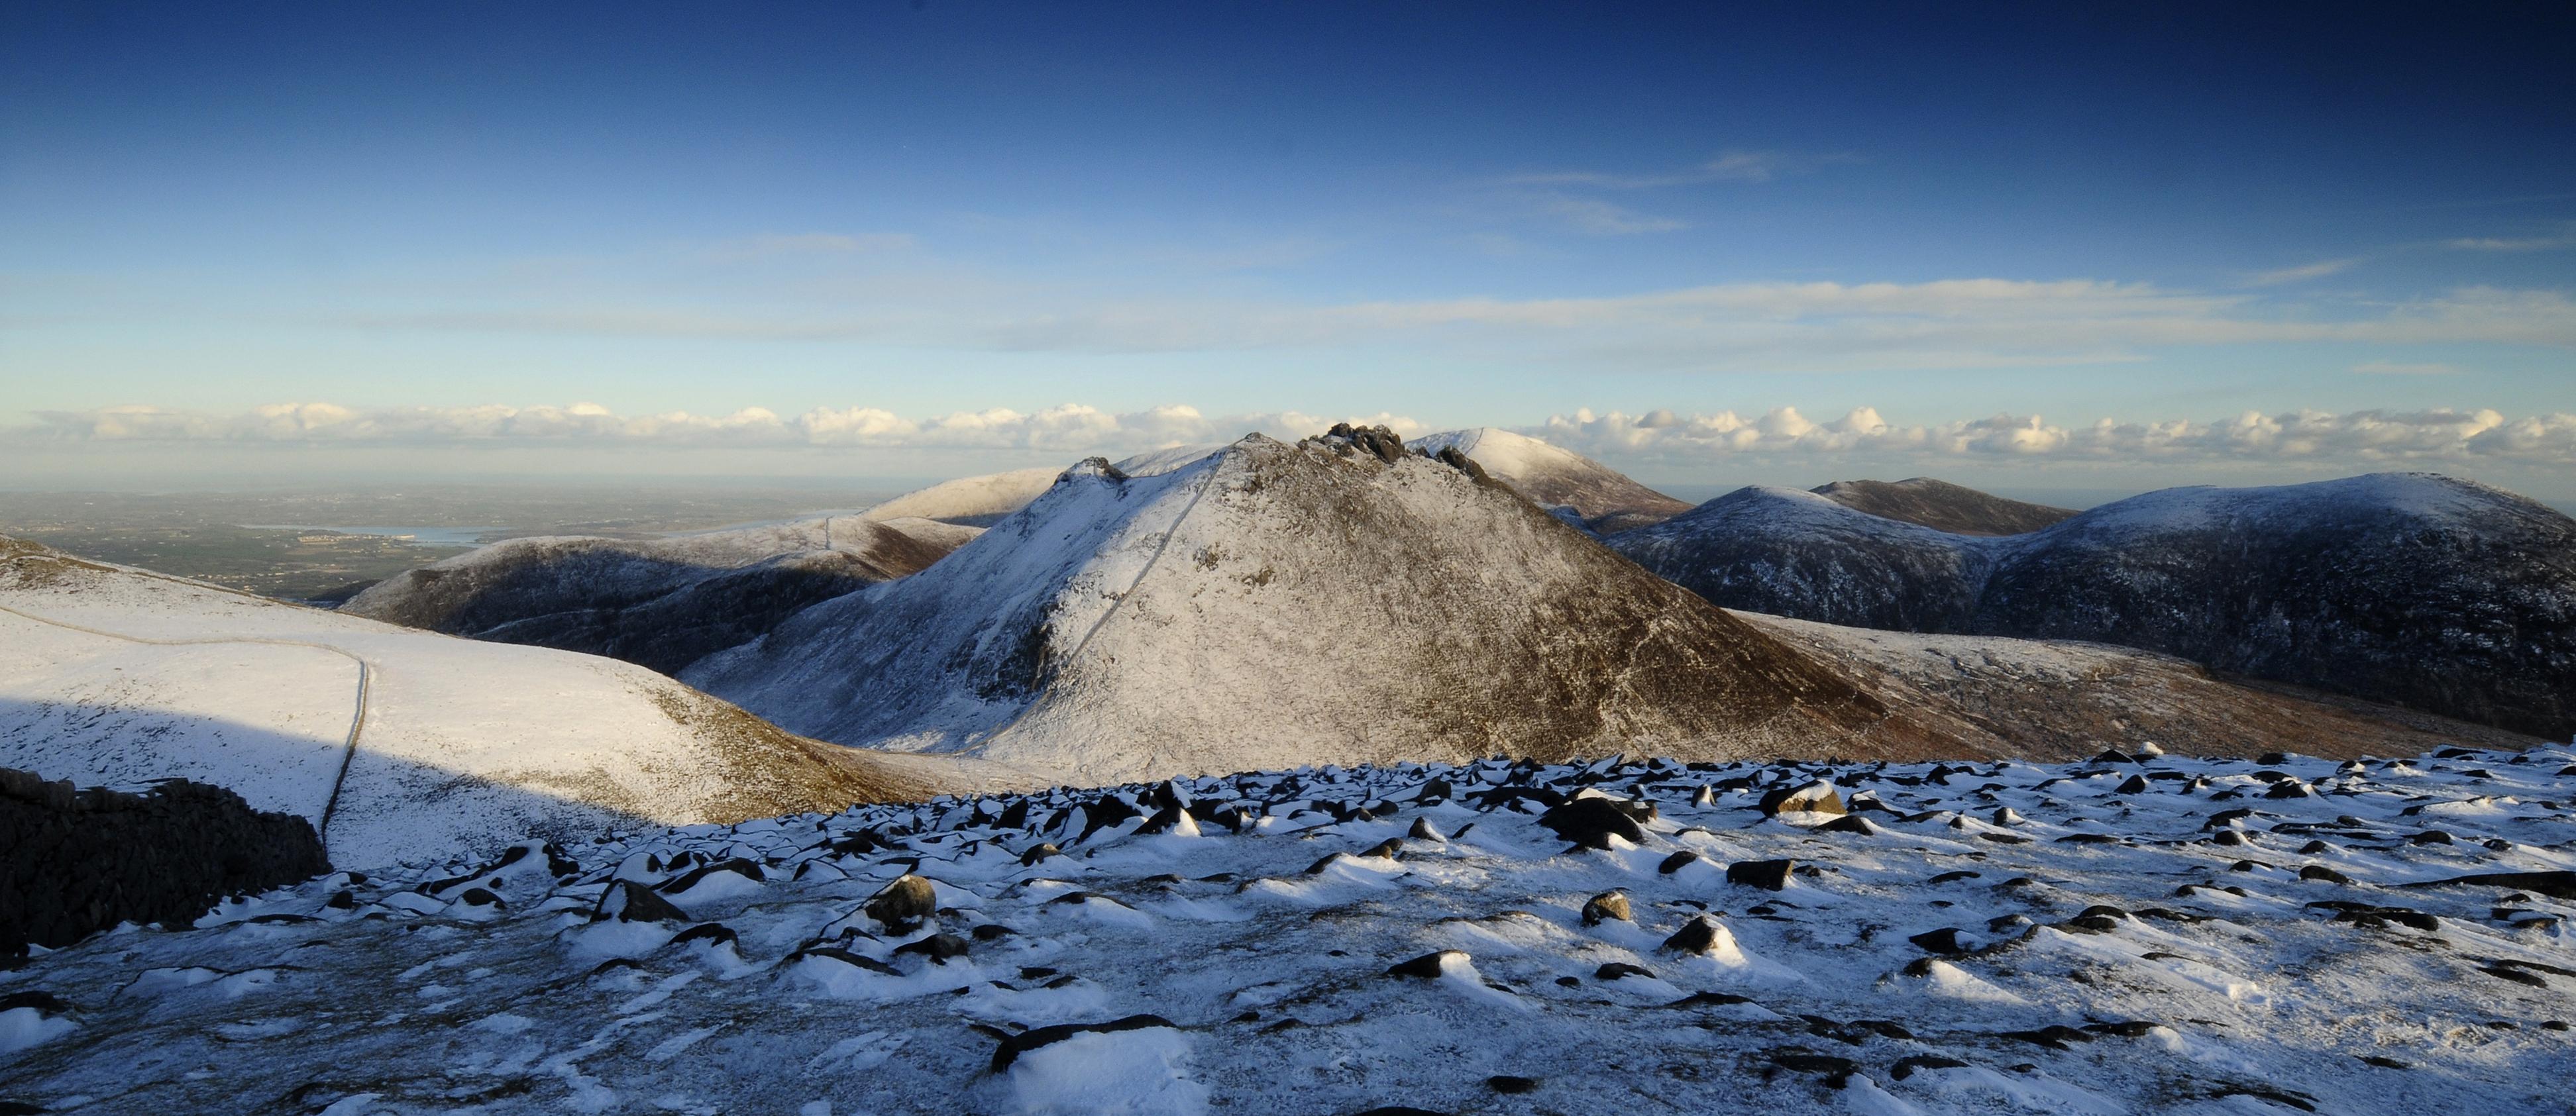 Winter Panoramic of Slieve Bearnagh